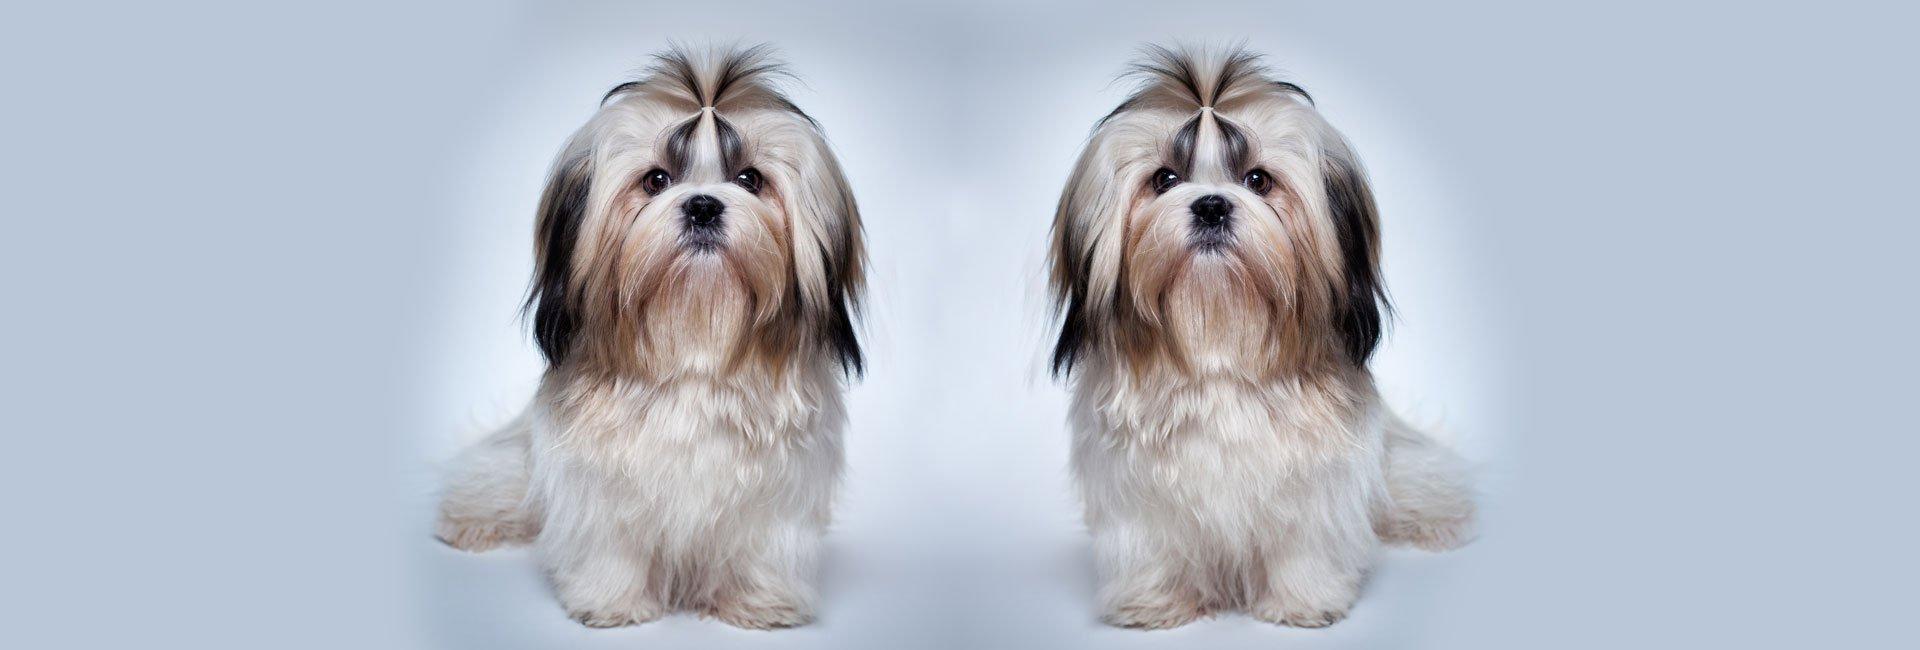 2 similar looking pets